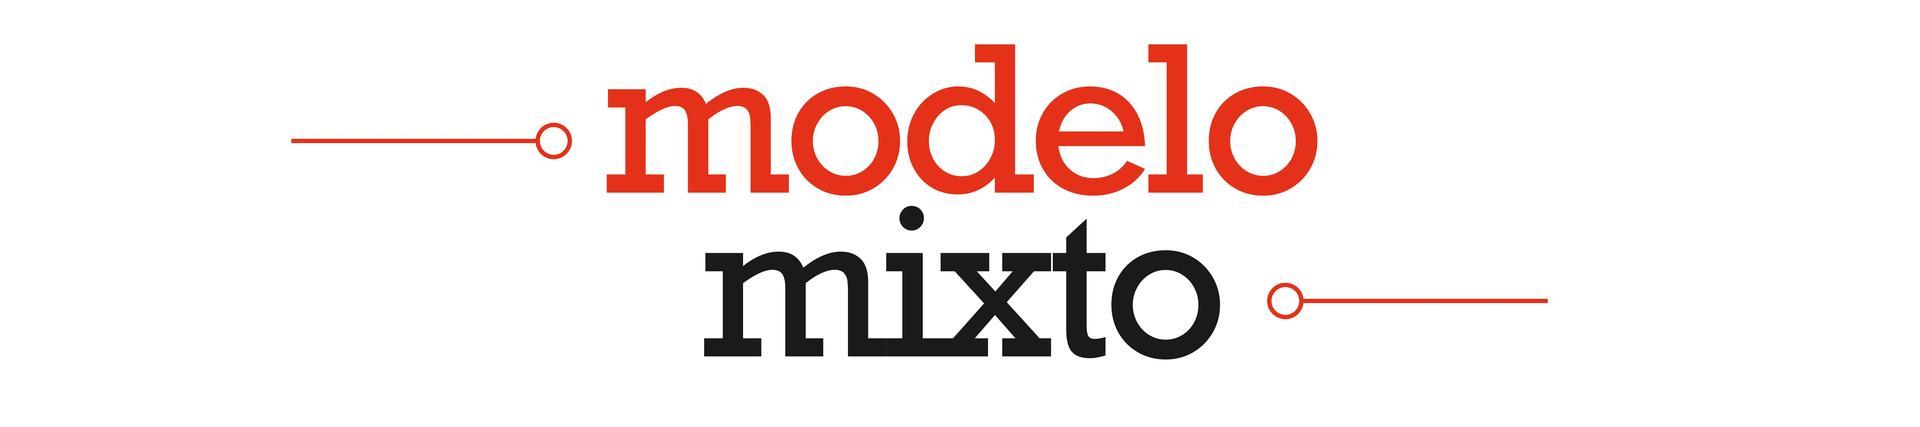 modelo mixto